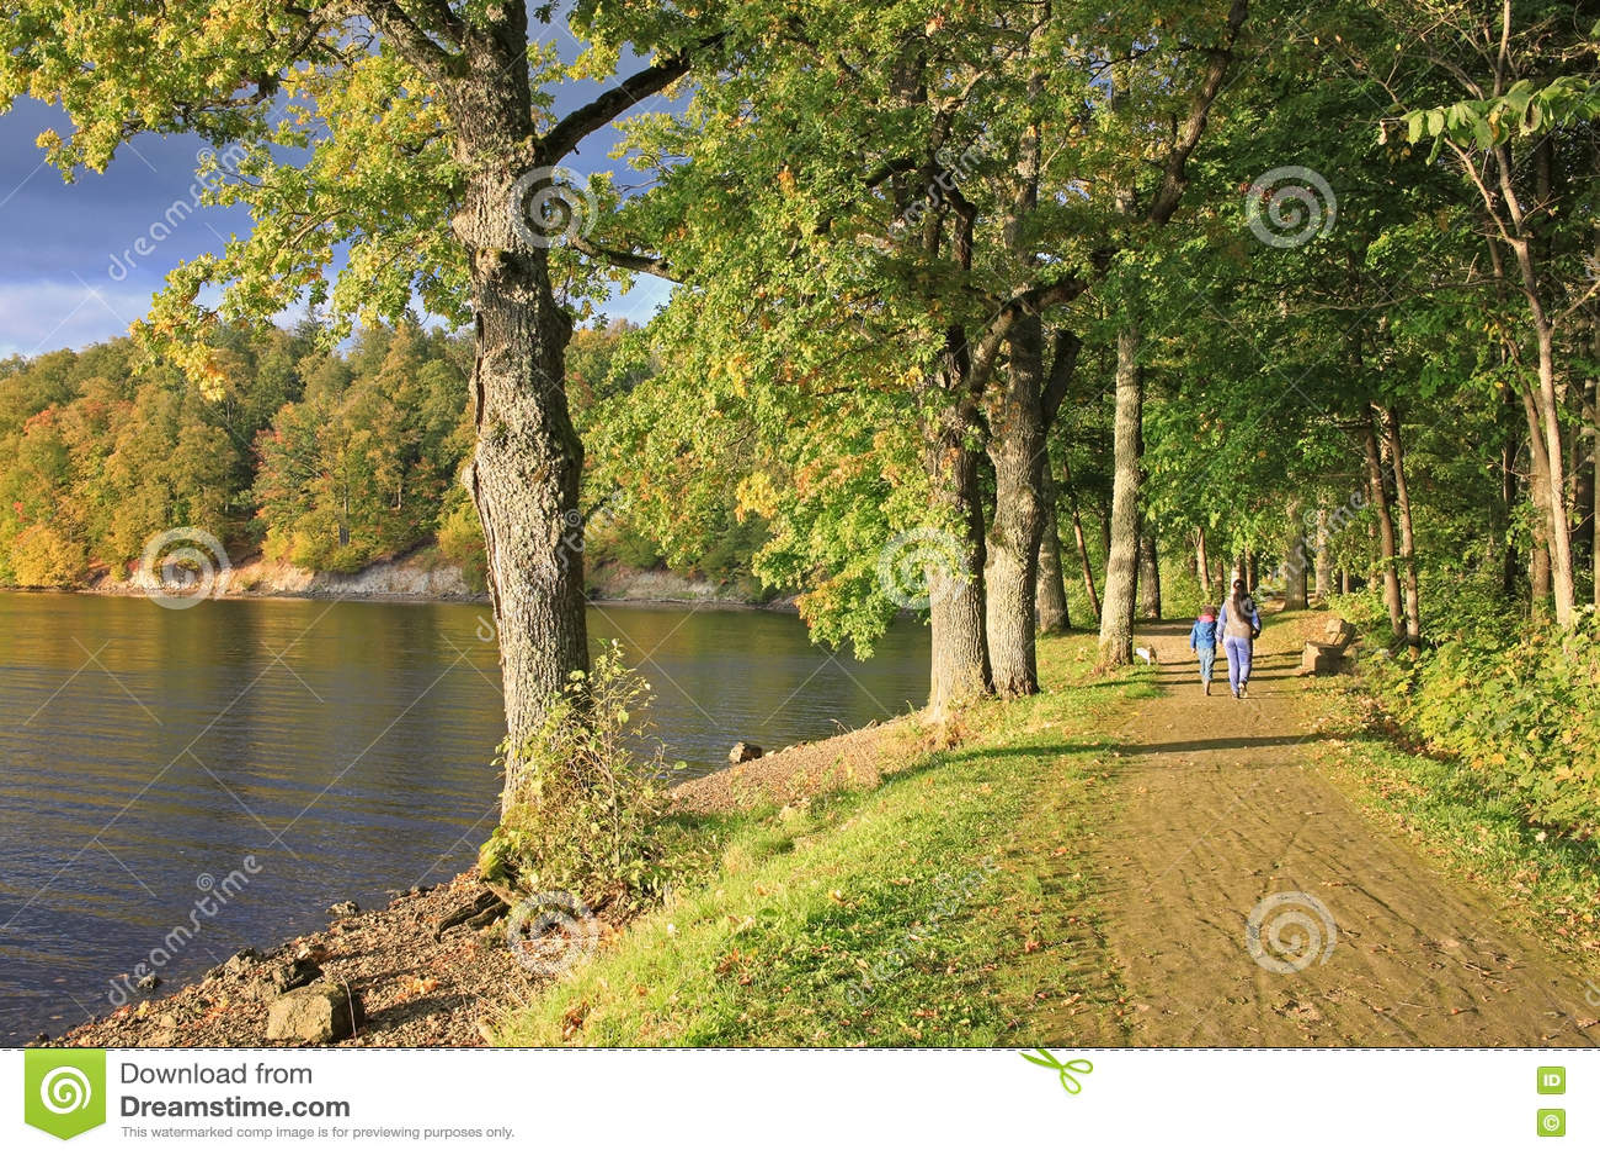 latvian autumn forest river - photo #2